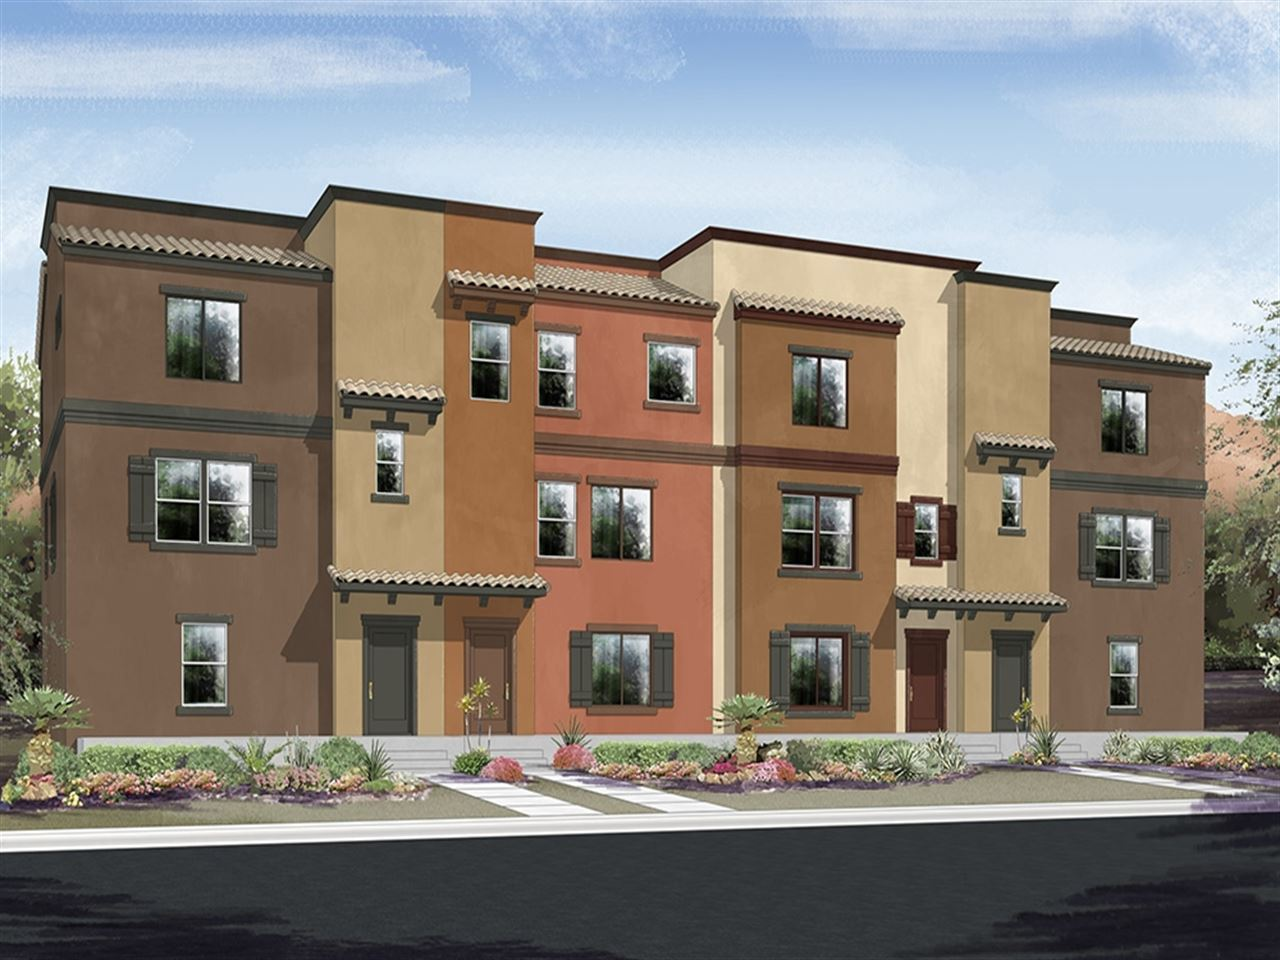 Ryland homes monteverdi rossi 1084149 north las vegas for Ryland homes